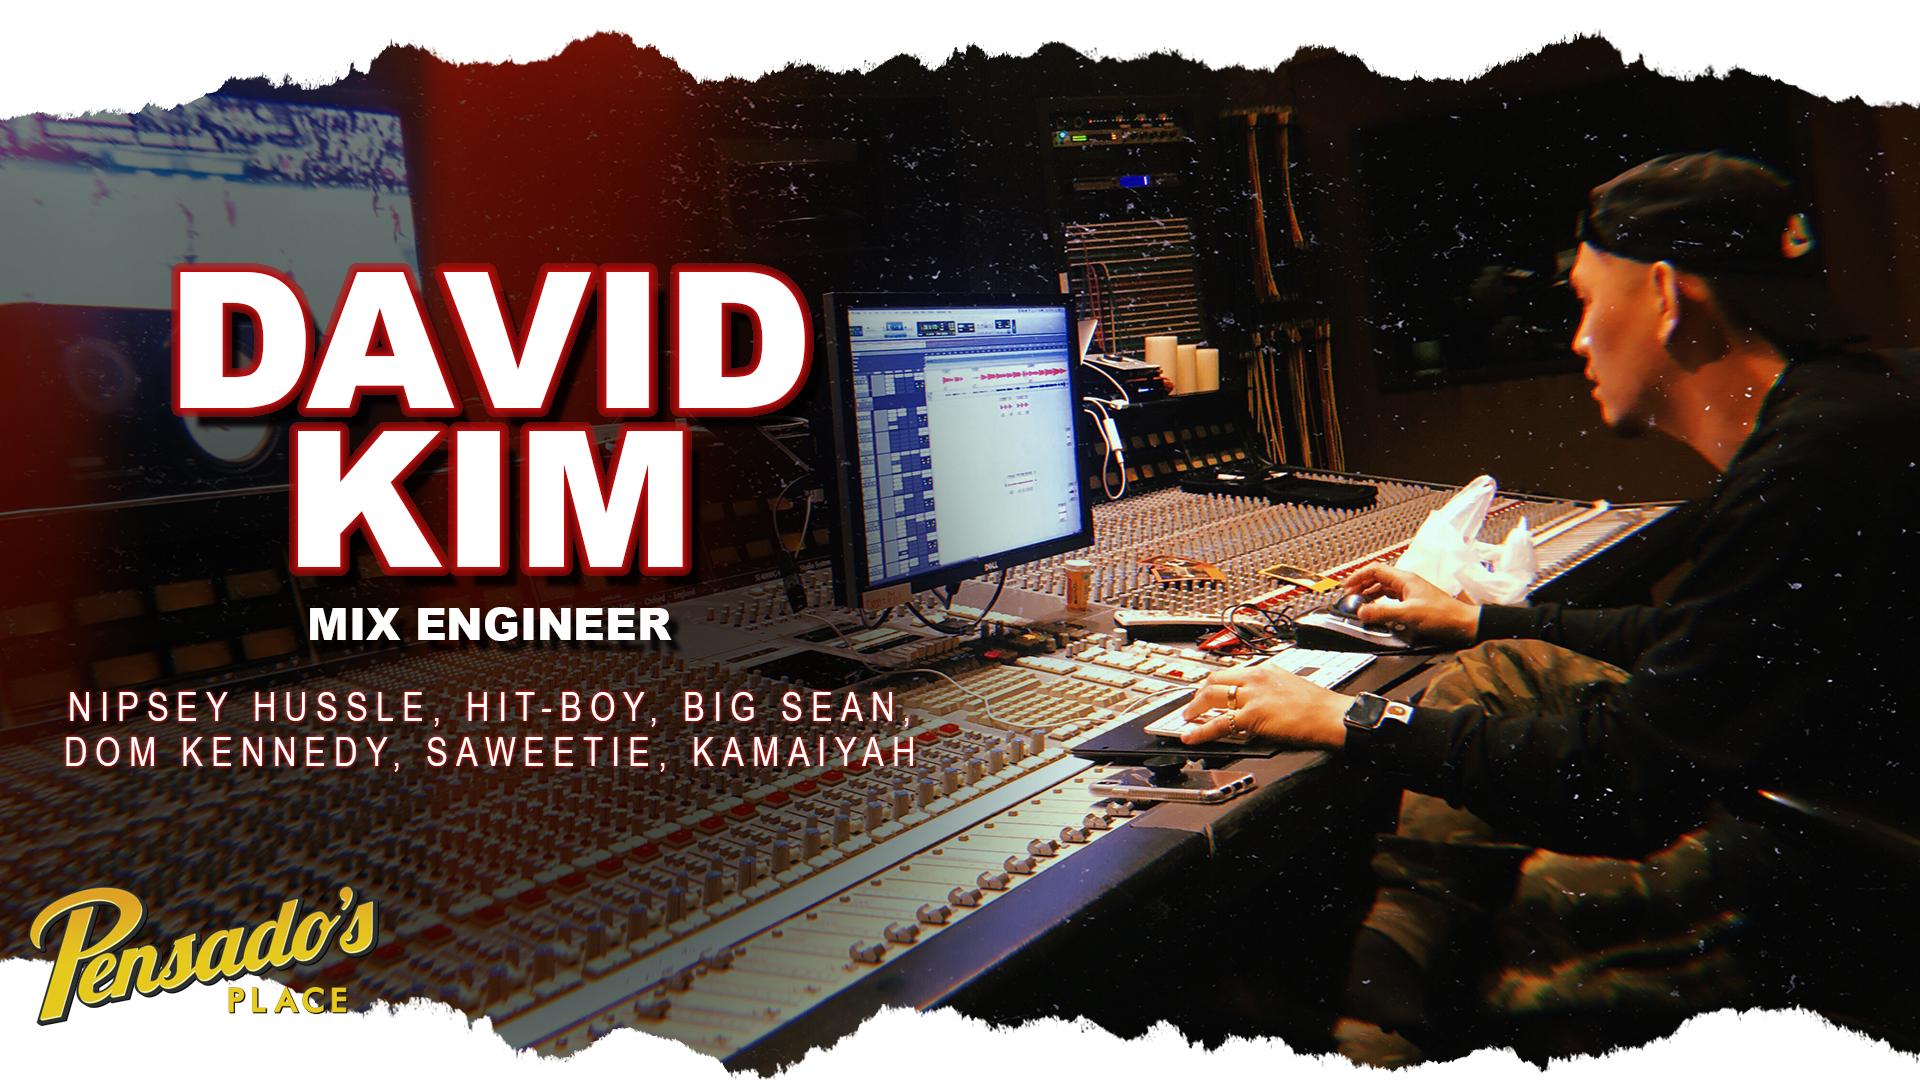 Grammy Award Winning Mix Engineer, David Kim